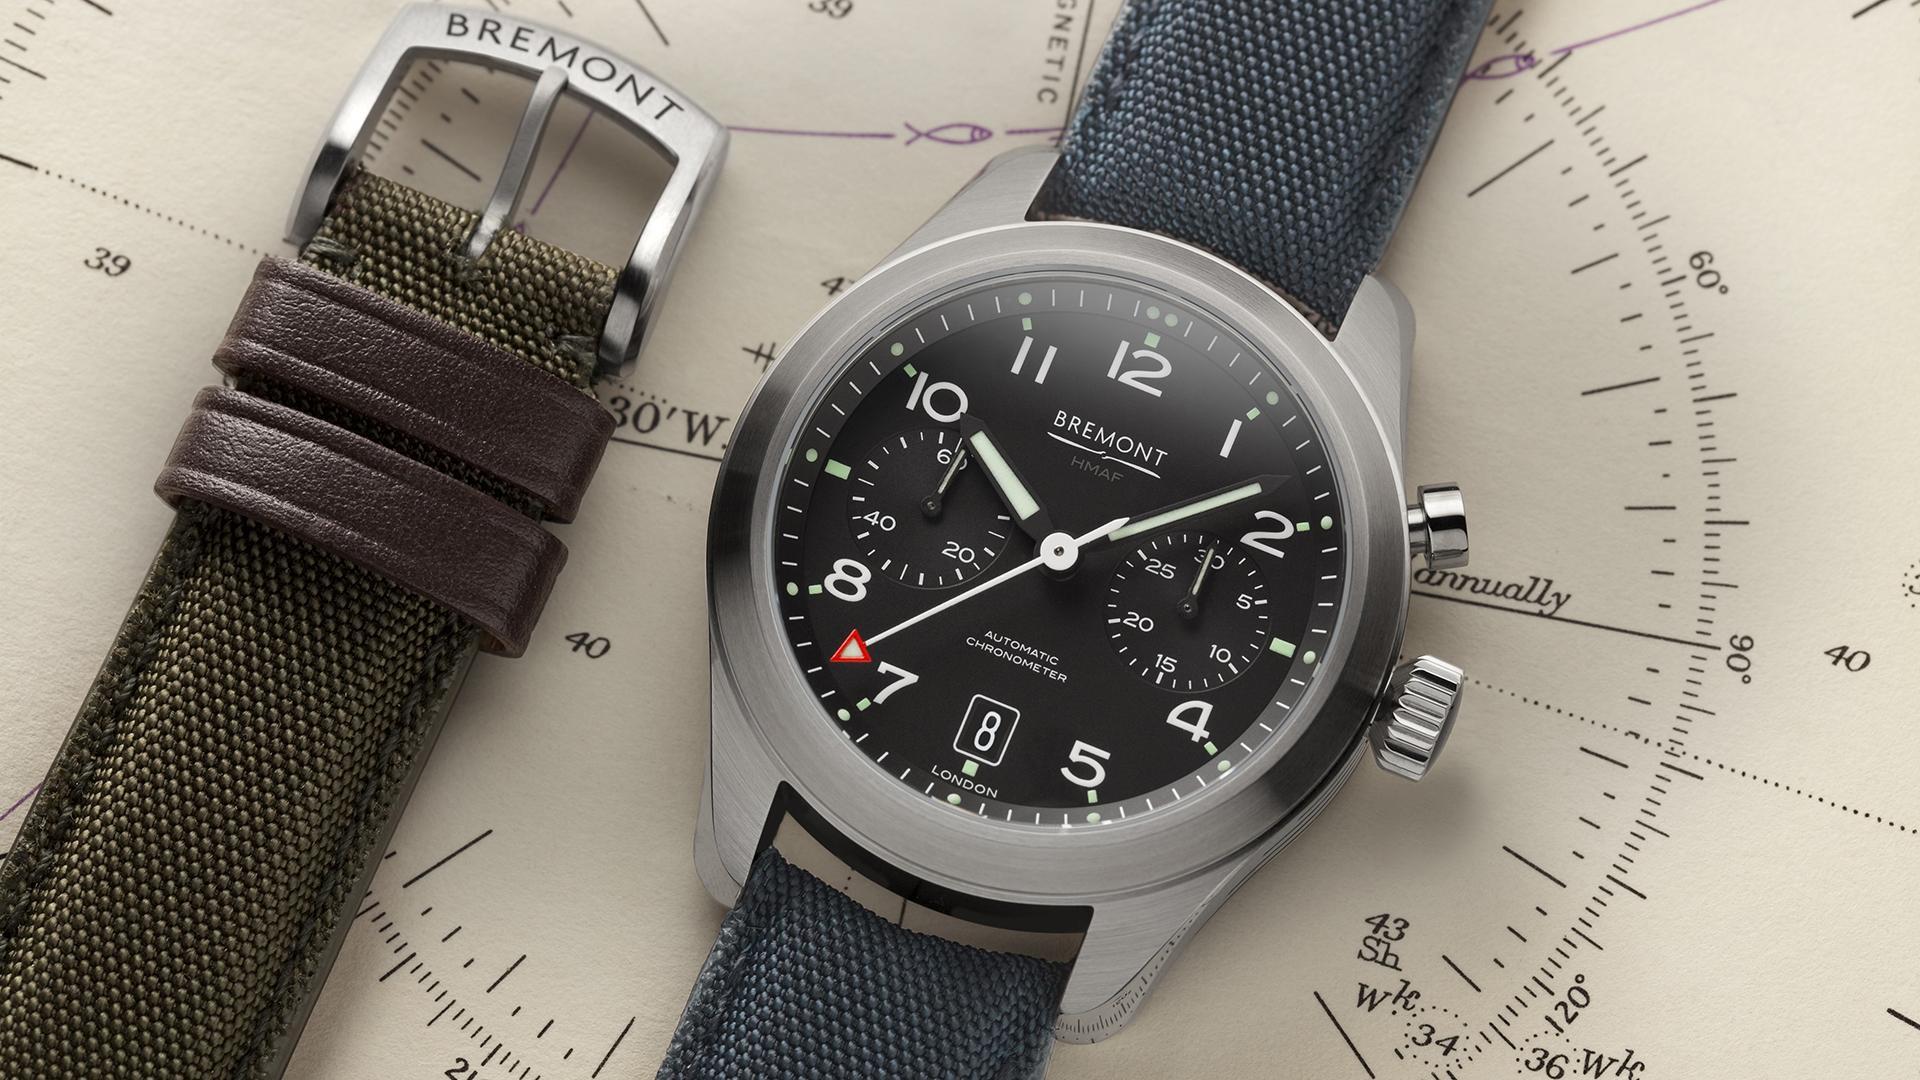 Bremont HMAF Automatic Chronometer